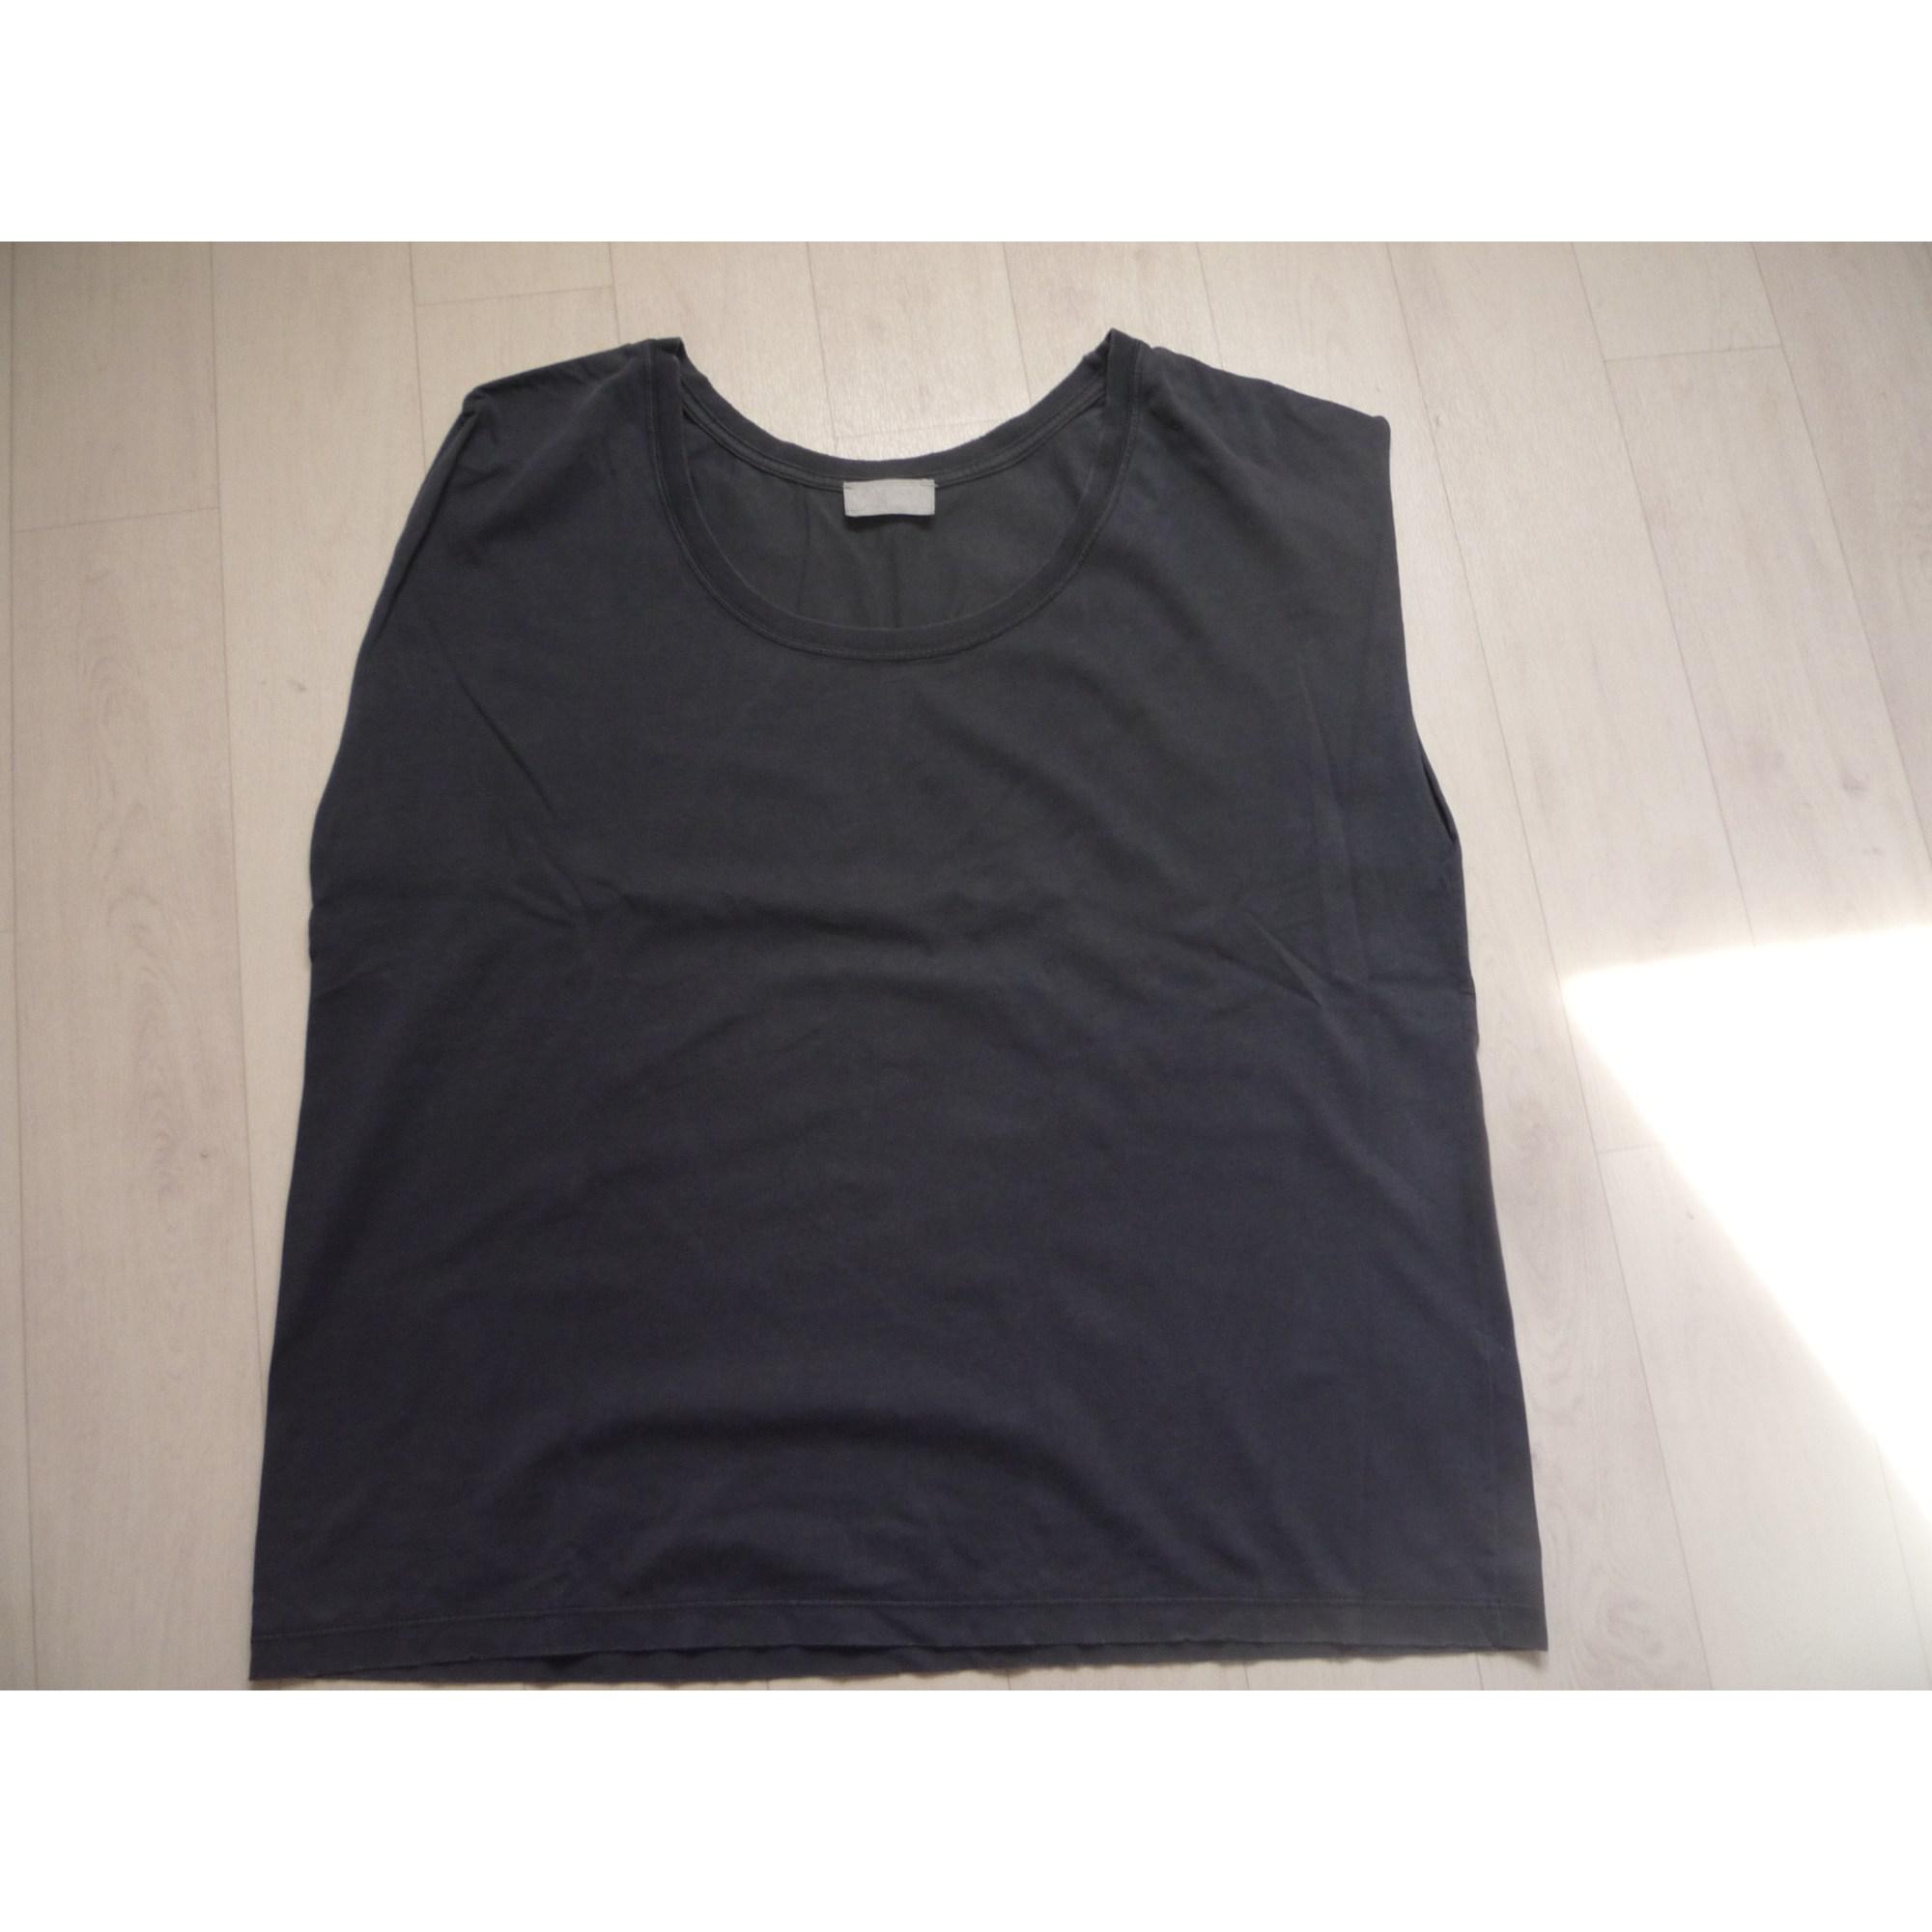 Top, tee-shirt DIESEL Gris, anthracite